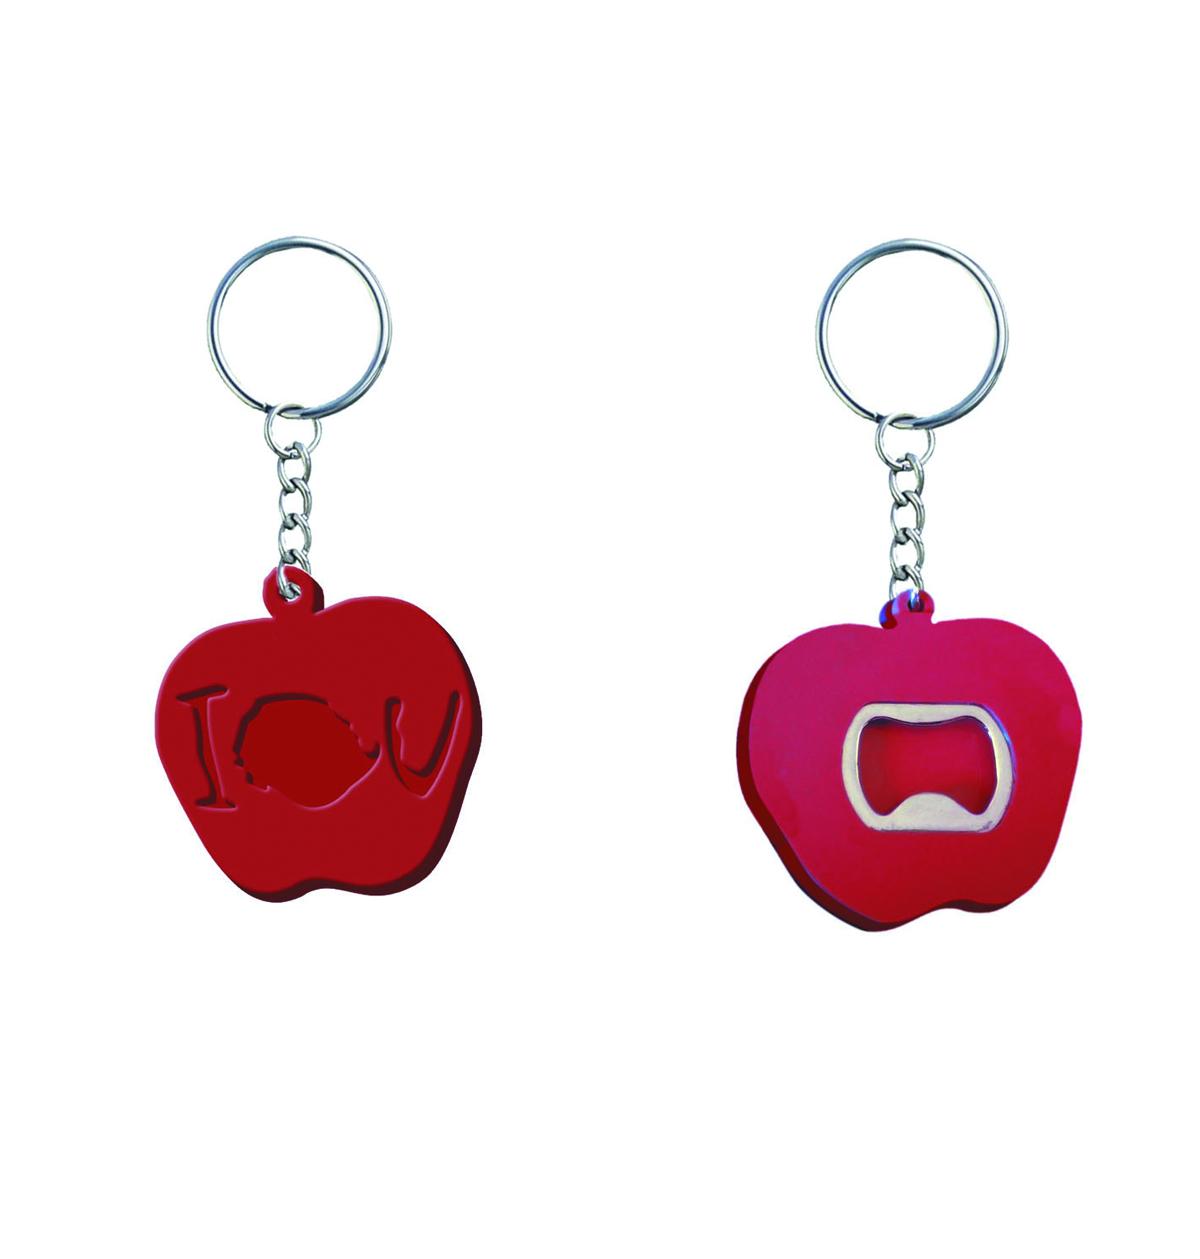 previewsworld sherlock iou apple bottle opener keychain c 1 1 2. Black Bedroom Furniture Sets. Home Design Ideas